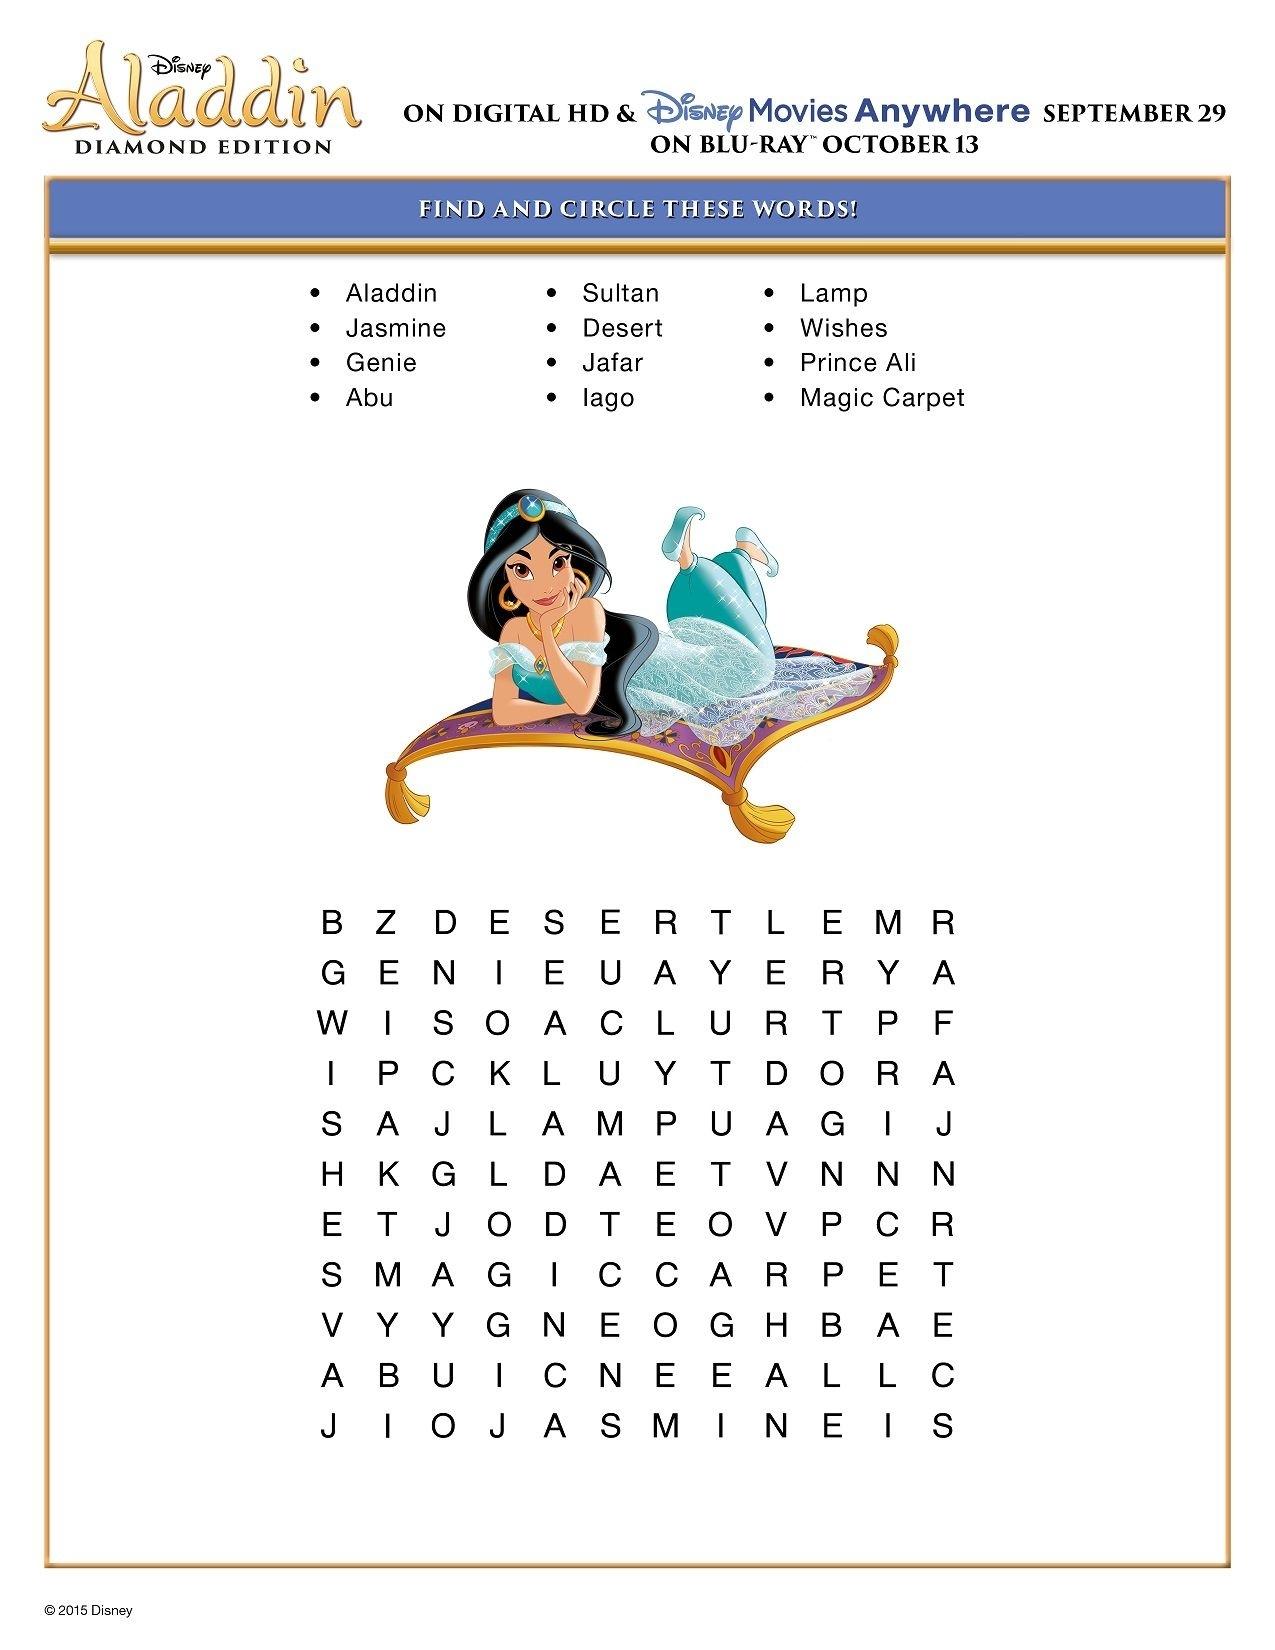 Free Printable Disney Aladdin Activity Sheets | Jasmine/aladdin with regard to Disney Princess Word Search Printable